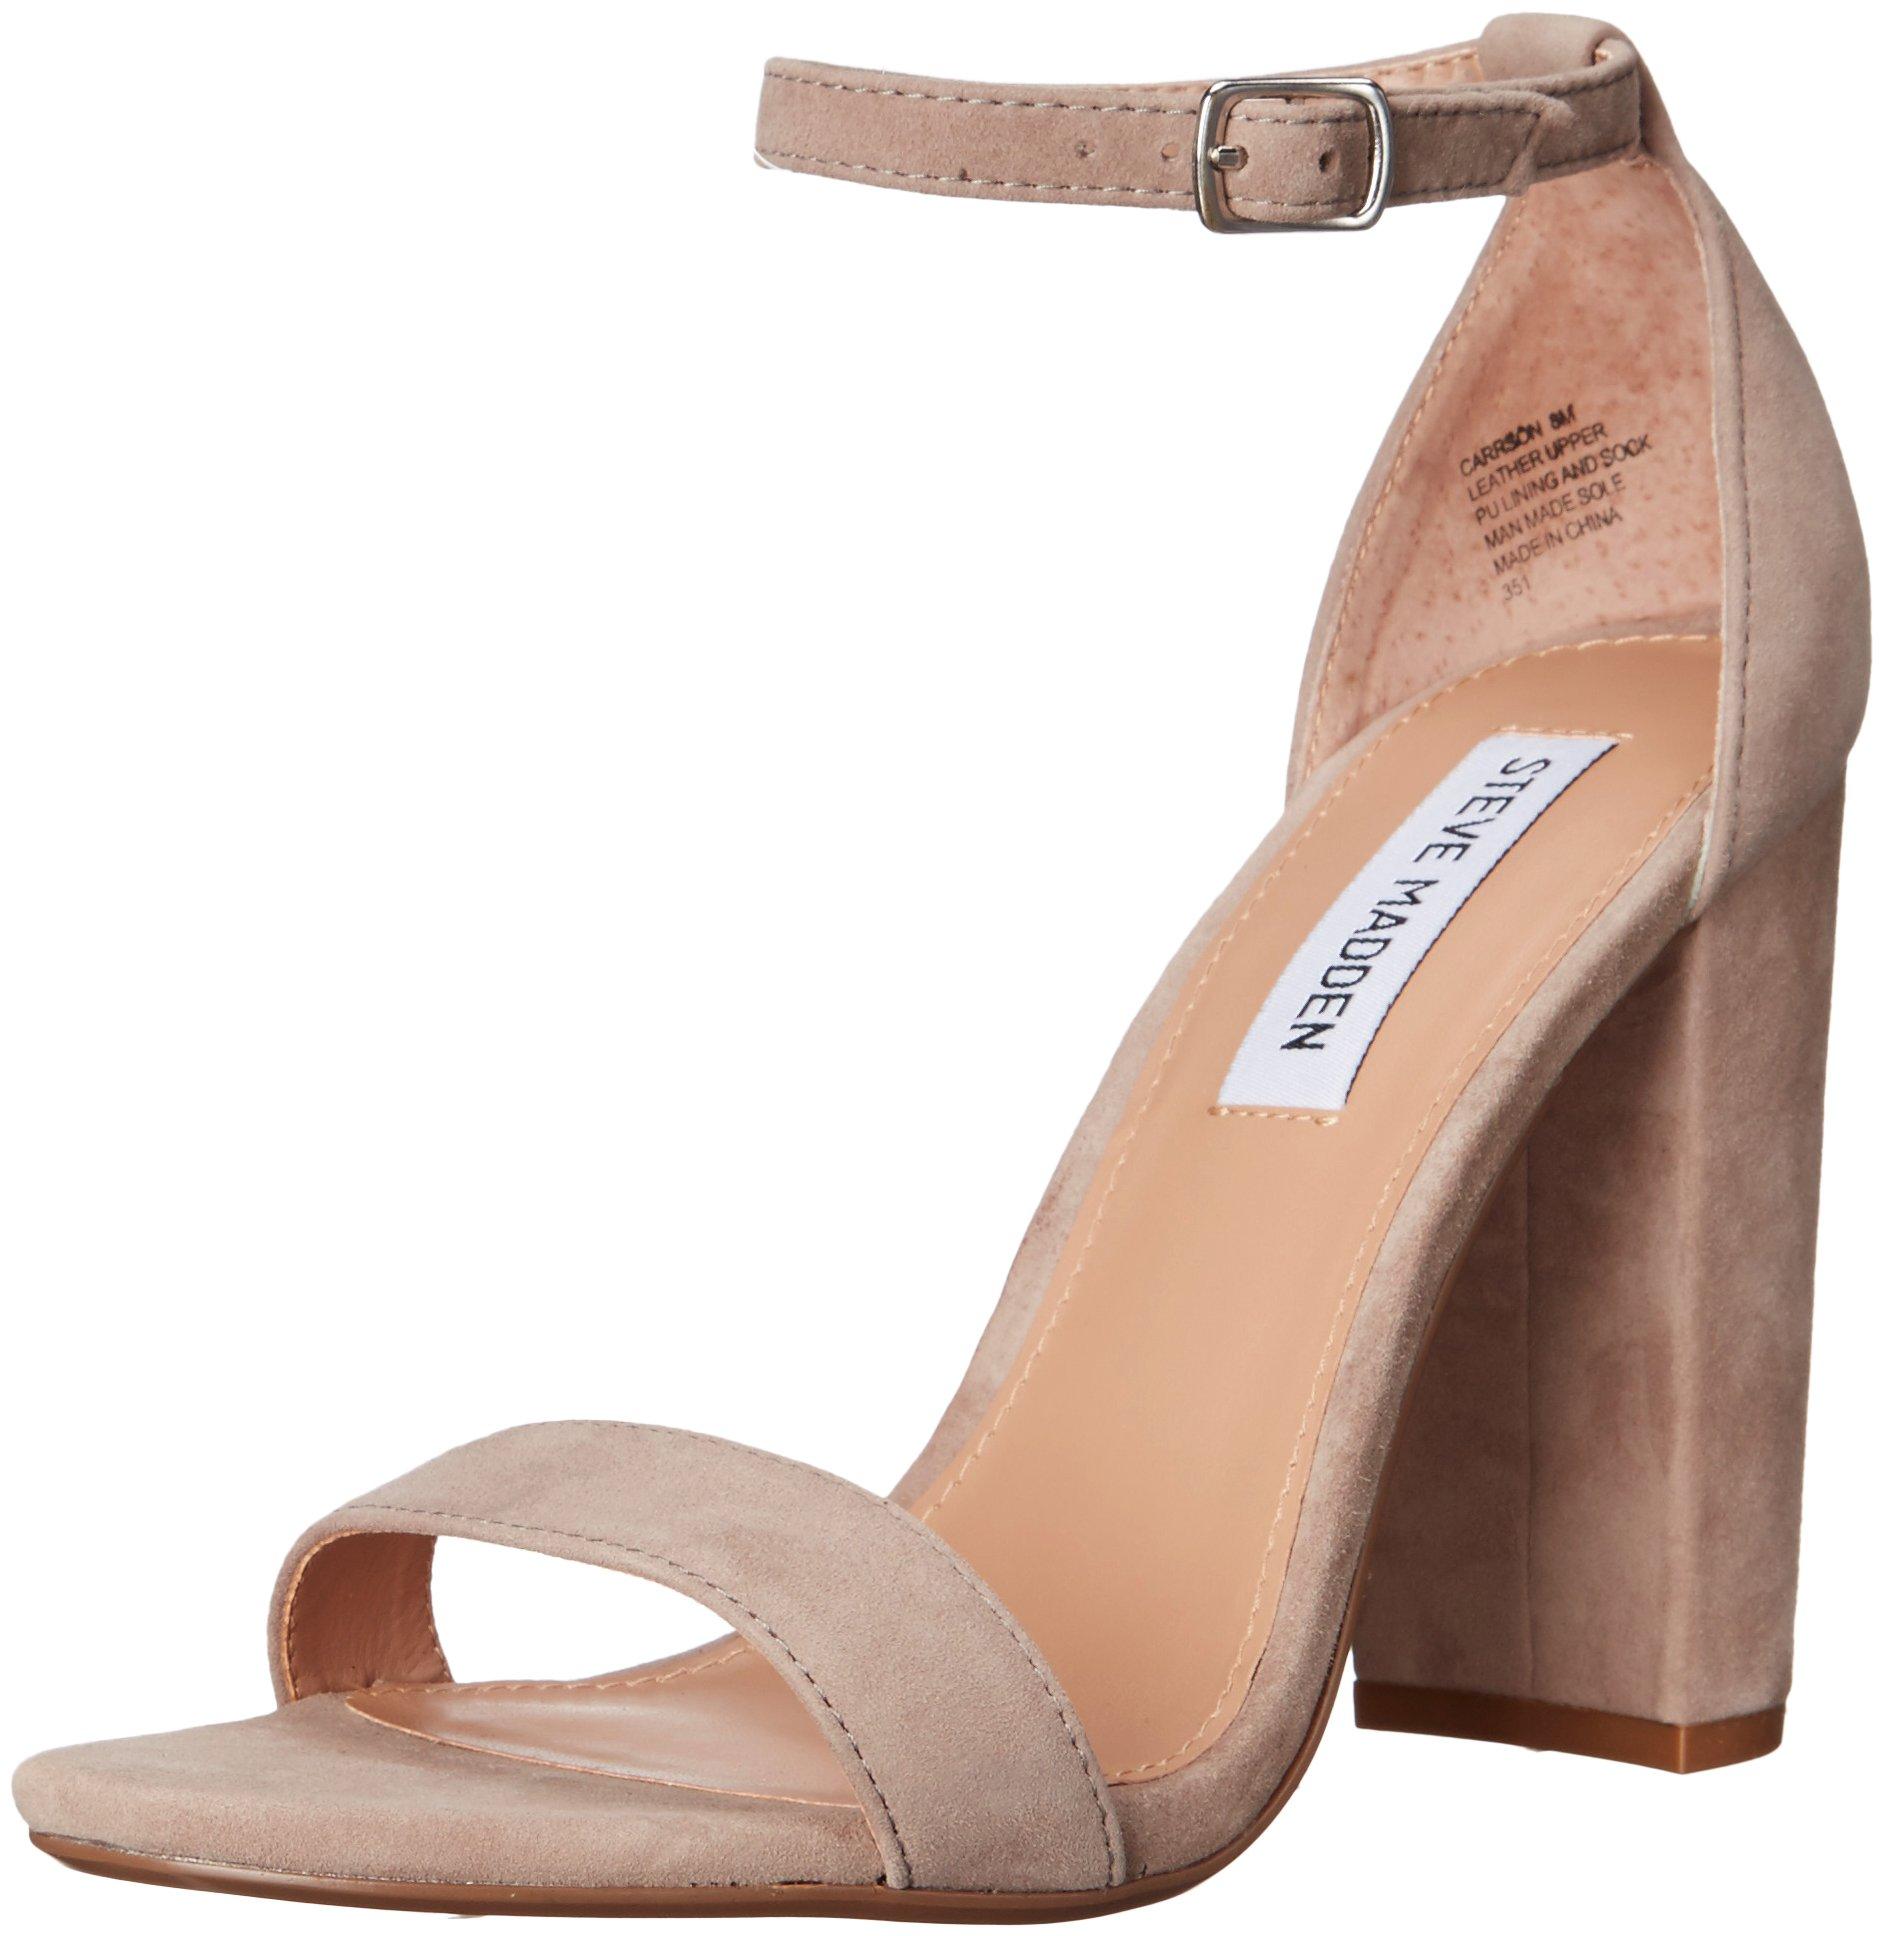 Steve Madden Women's Carrson Dress Sandal, Taupe Suede, 8.5 M US